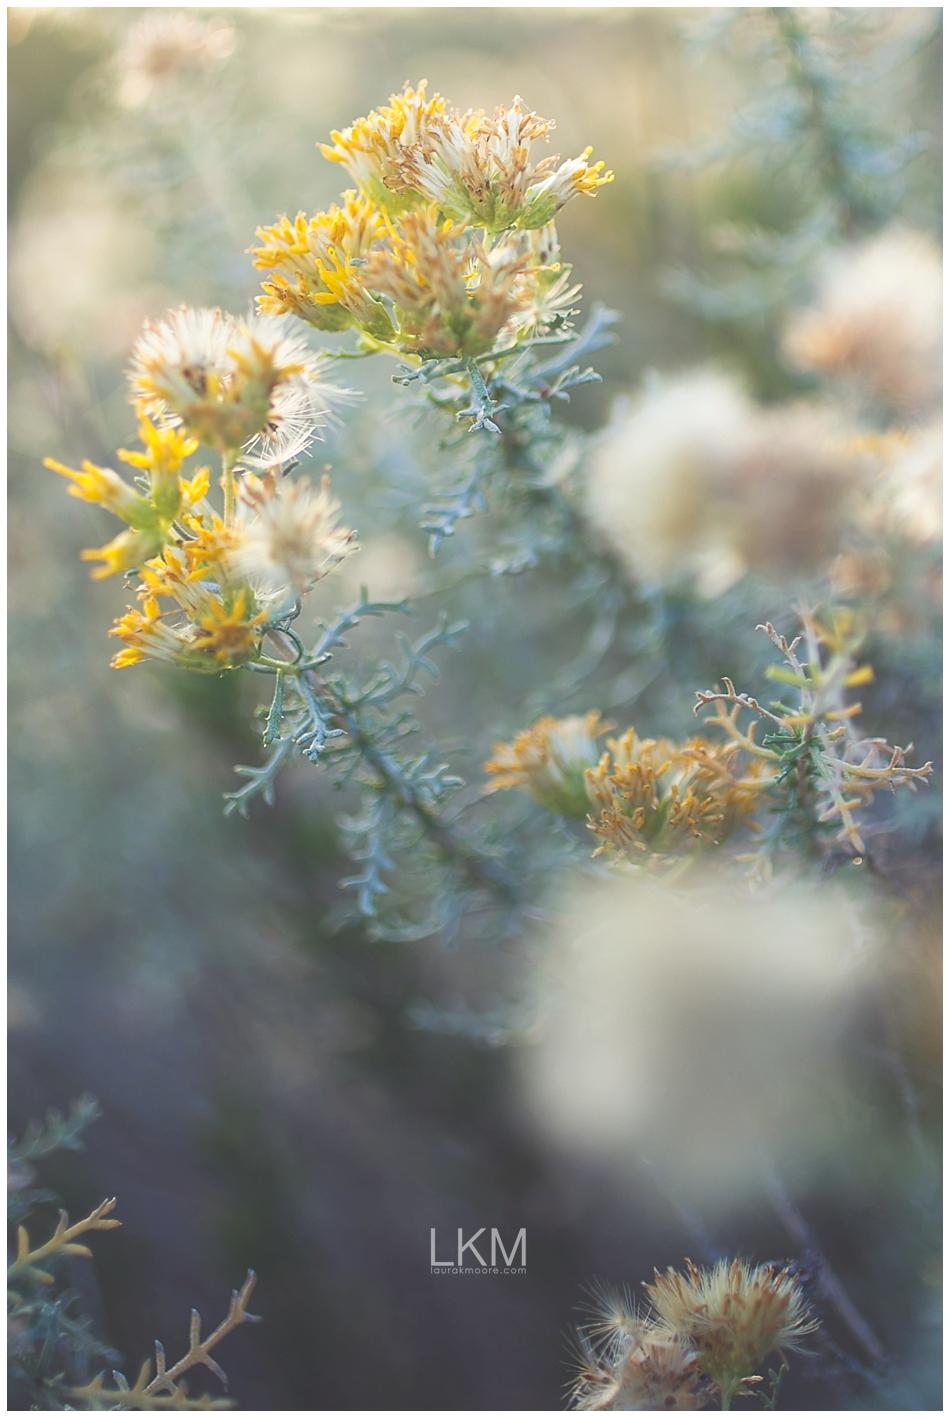 tucson-october-textures-wild-plant-life_0004.jpg